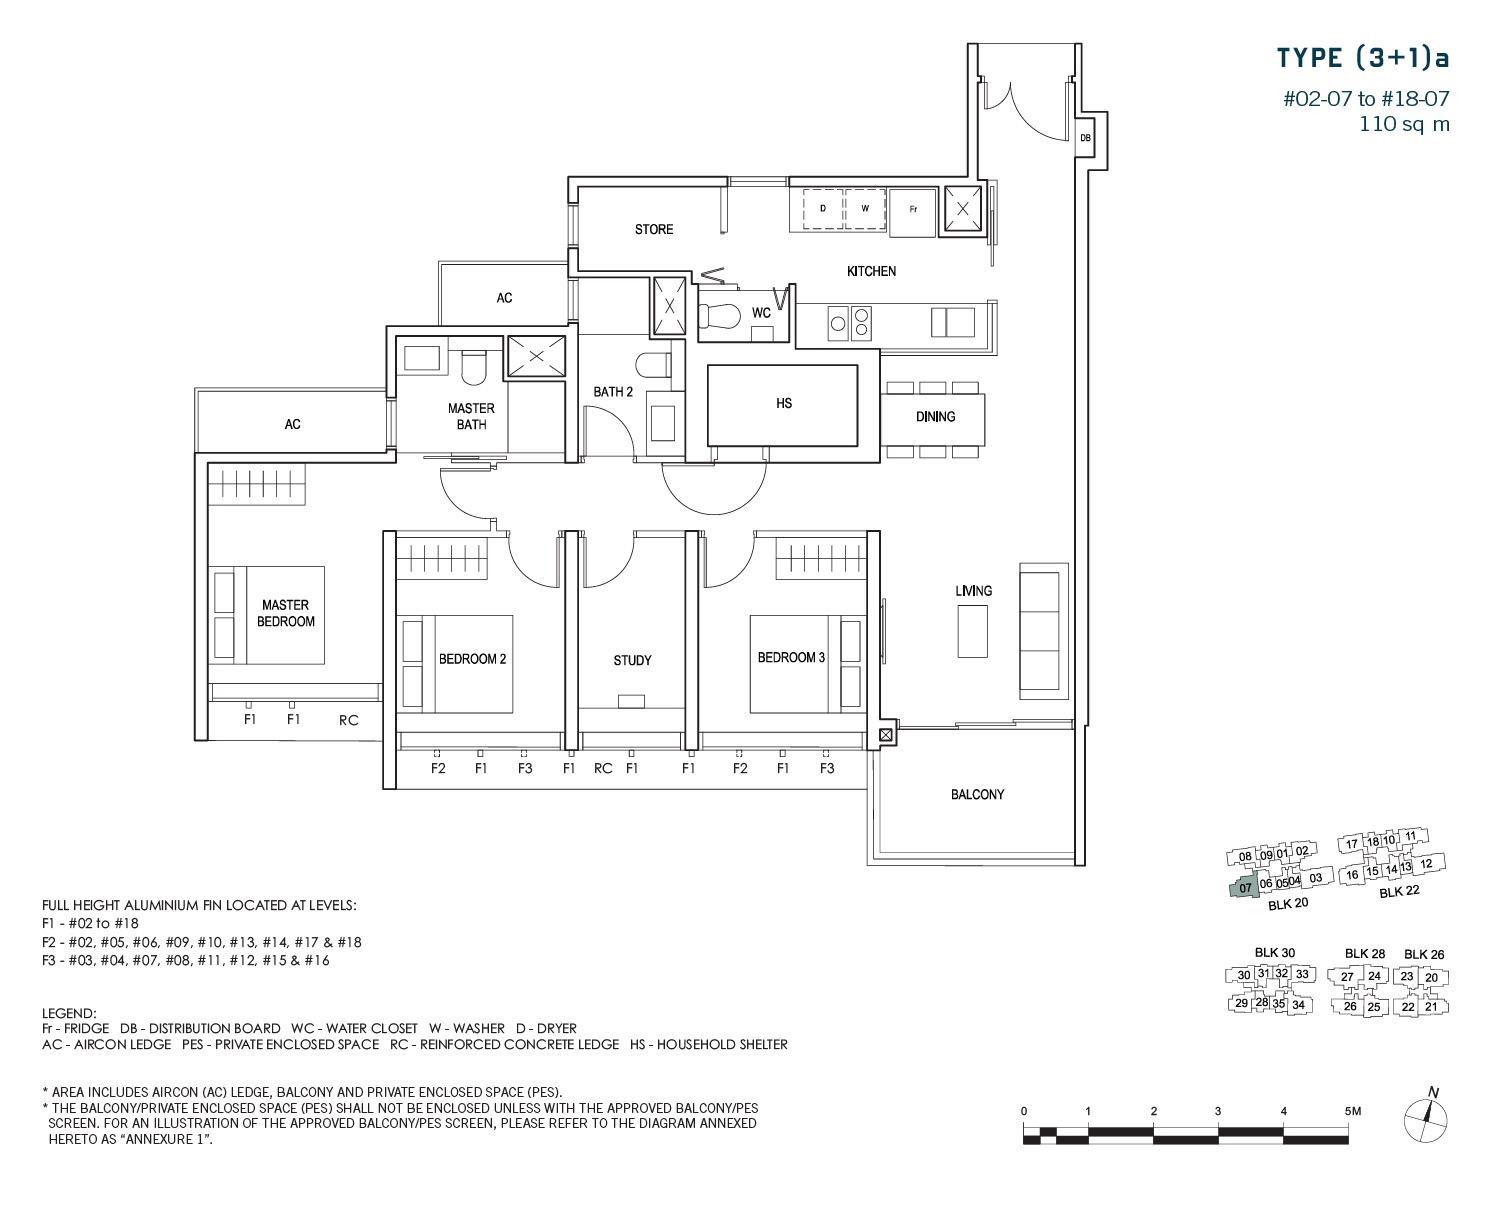 penrose-sims-floorplan 3BR+1